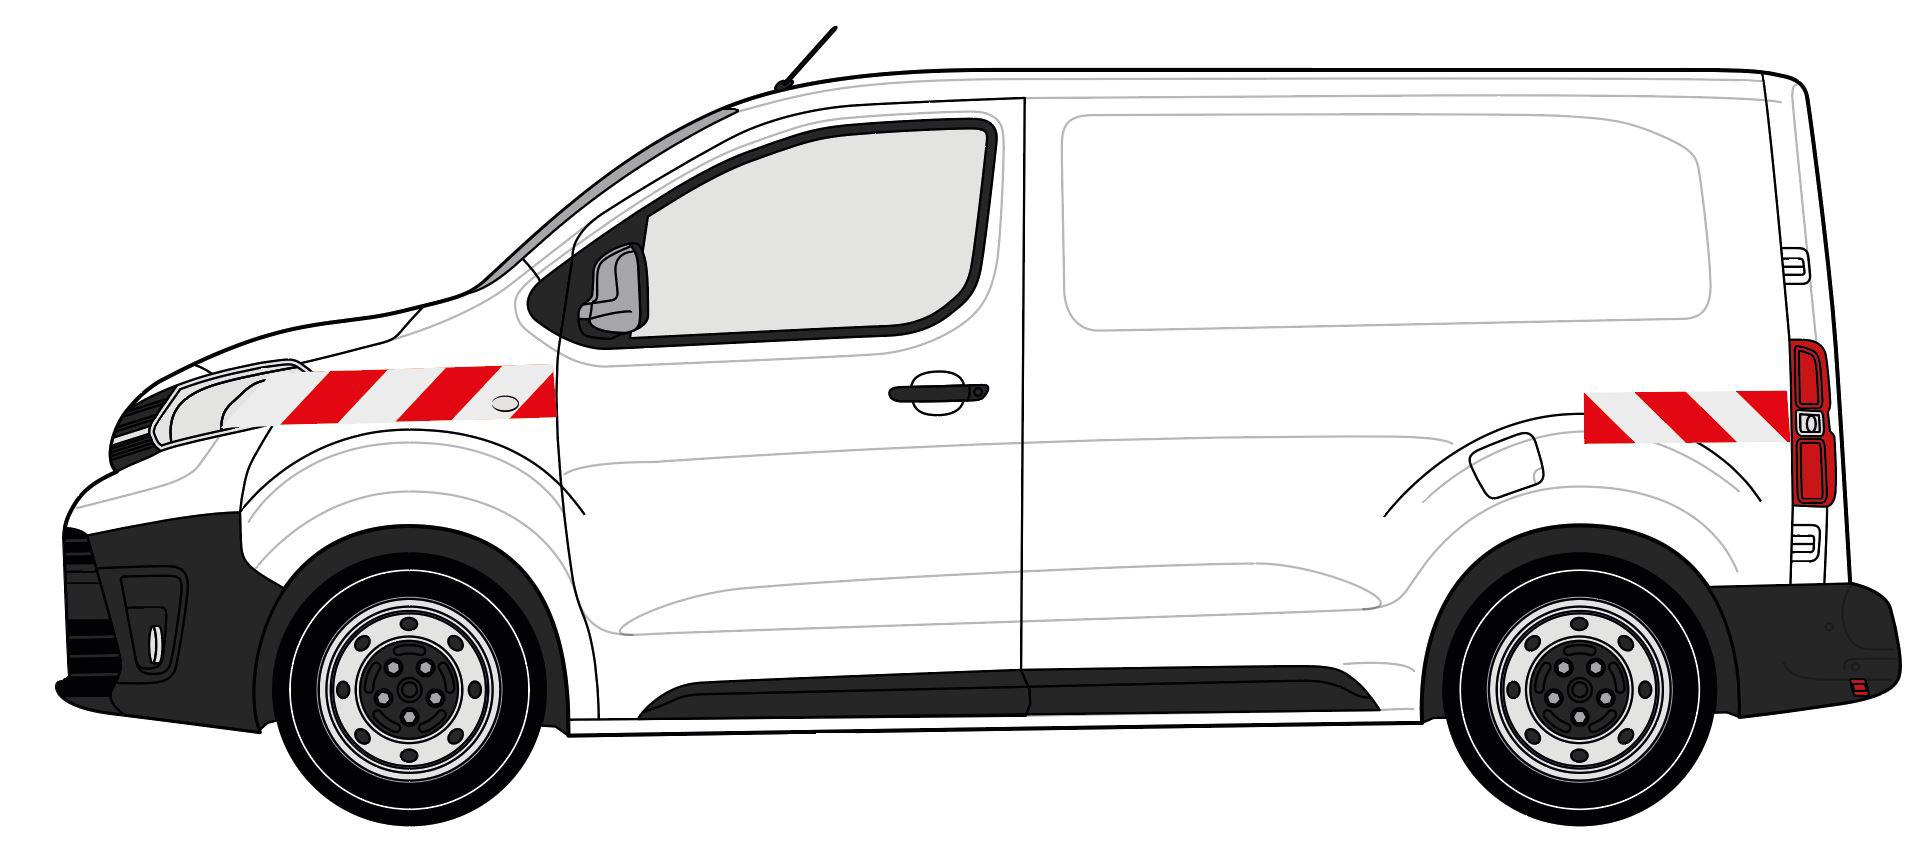 Toyota Proace BJ 10/2020-aktuell